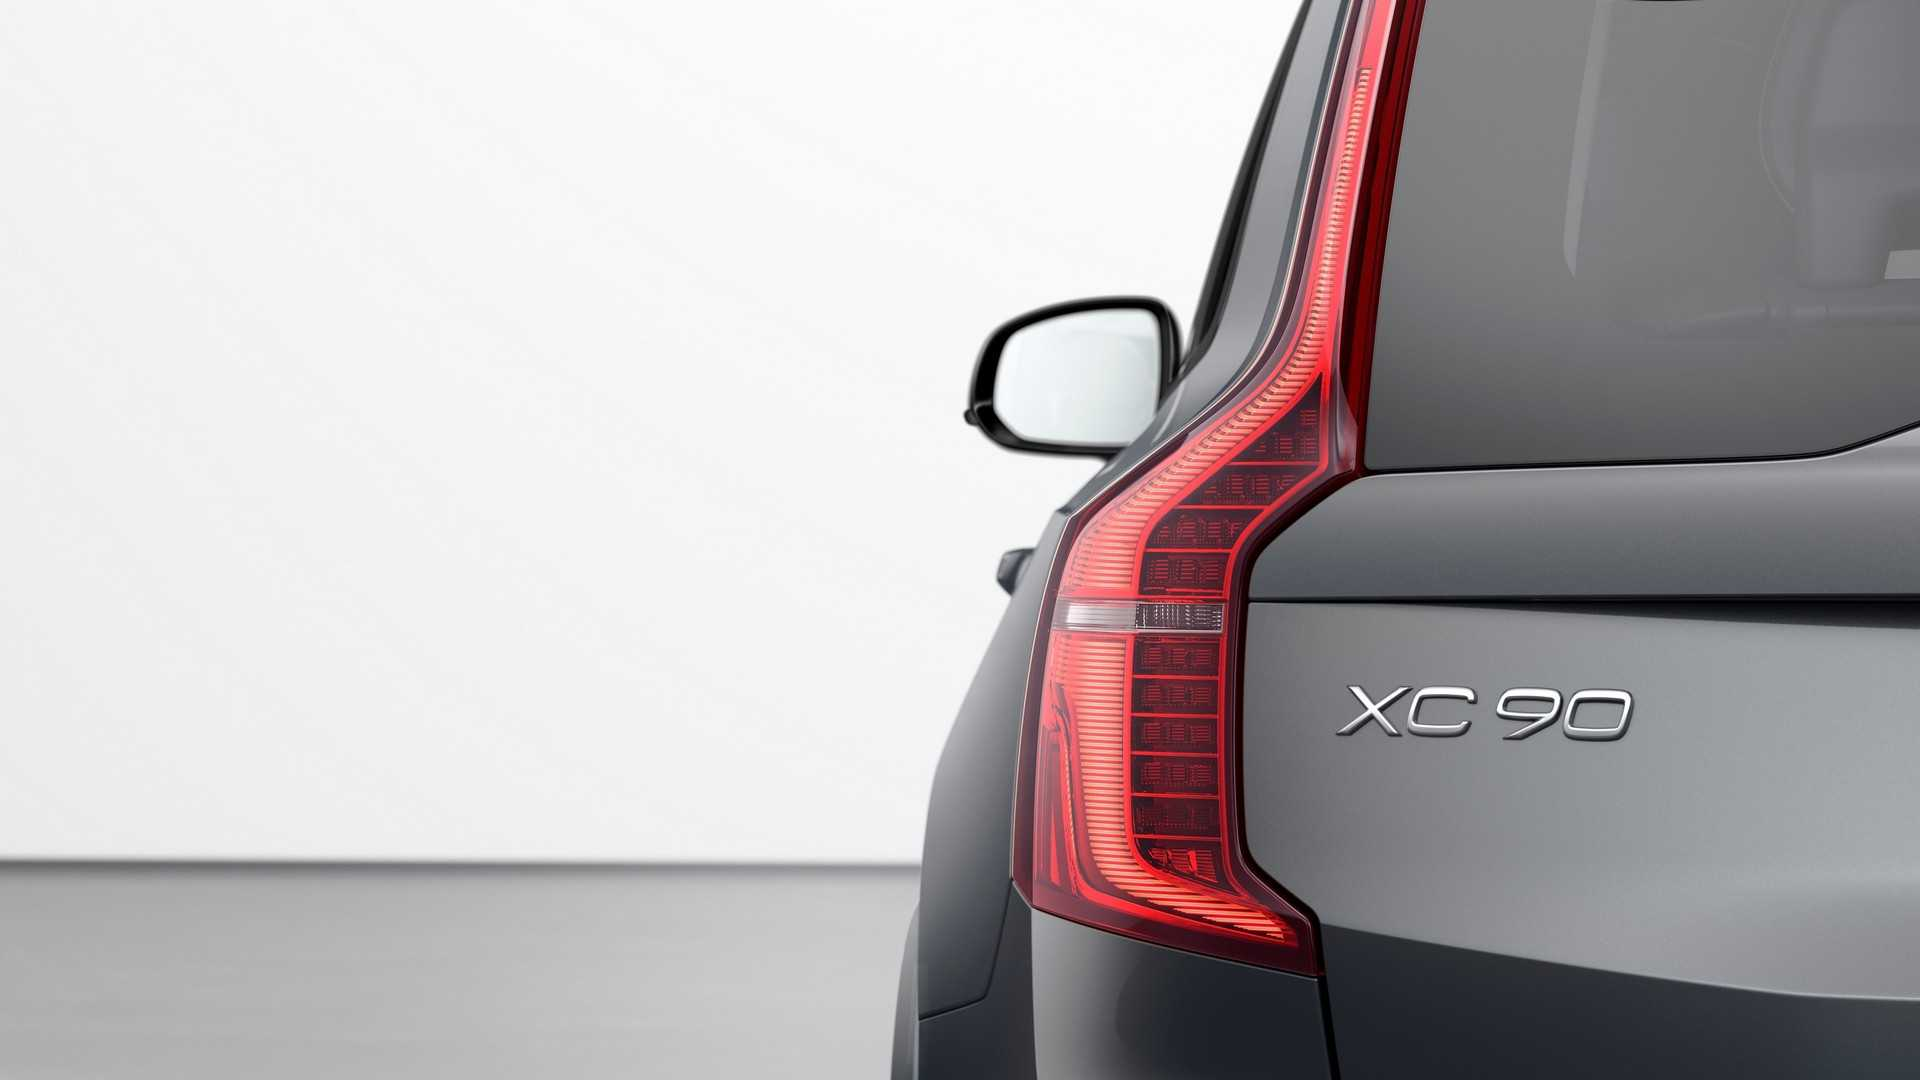 Next-gen Volvo XC90 to get electric version in 2022